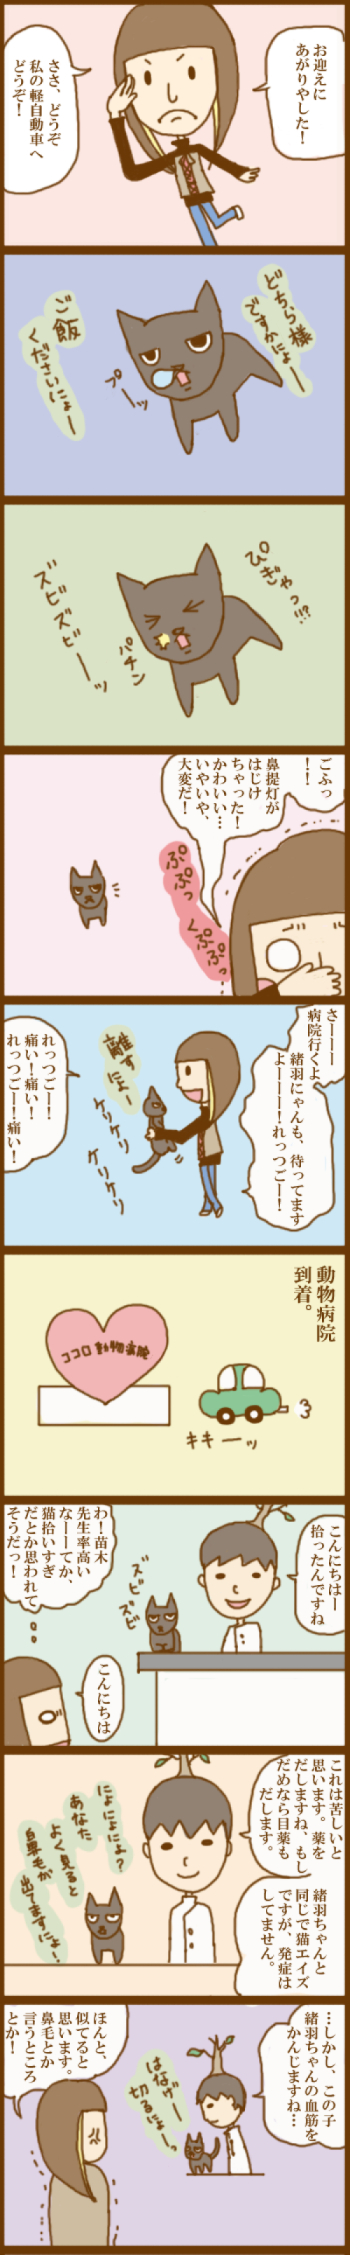 f:id:suzuokayu:20201101162249j:plain